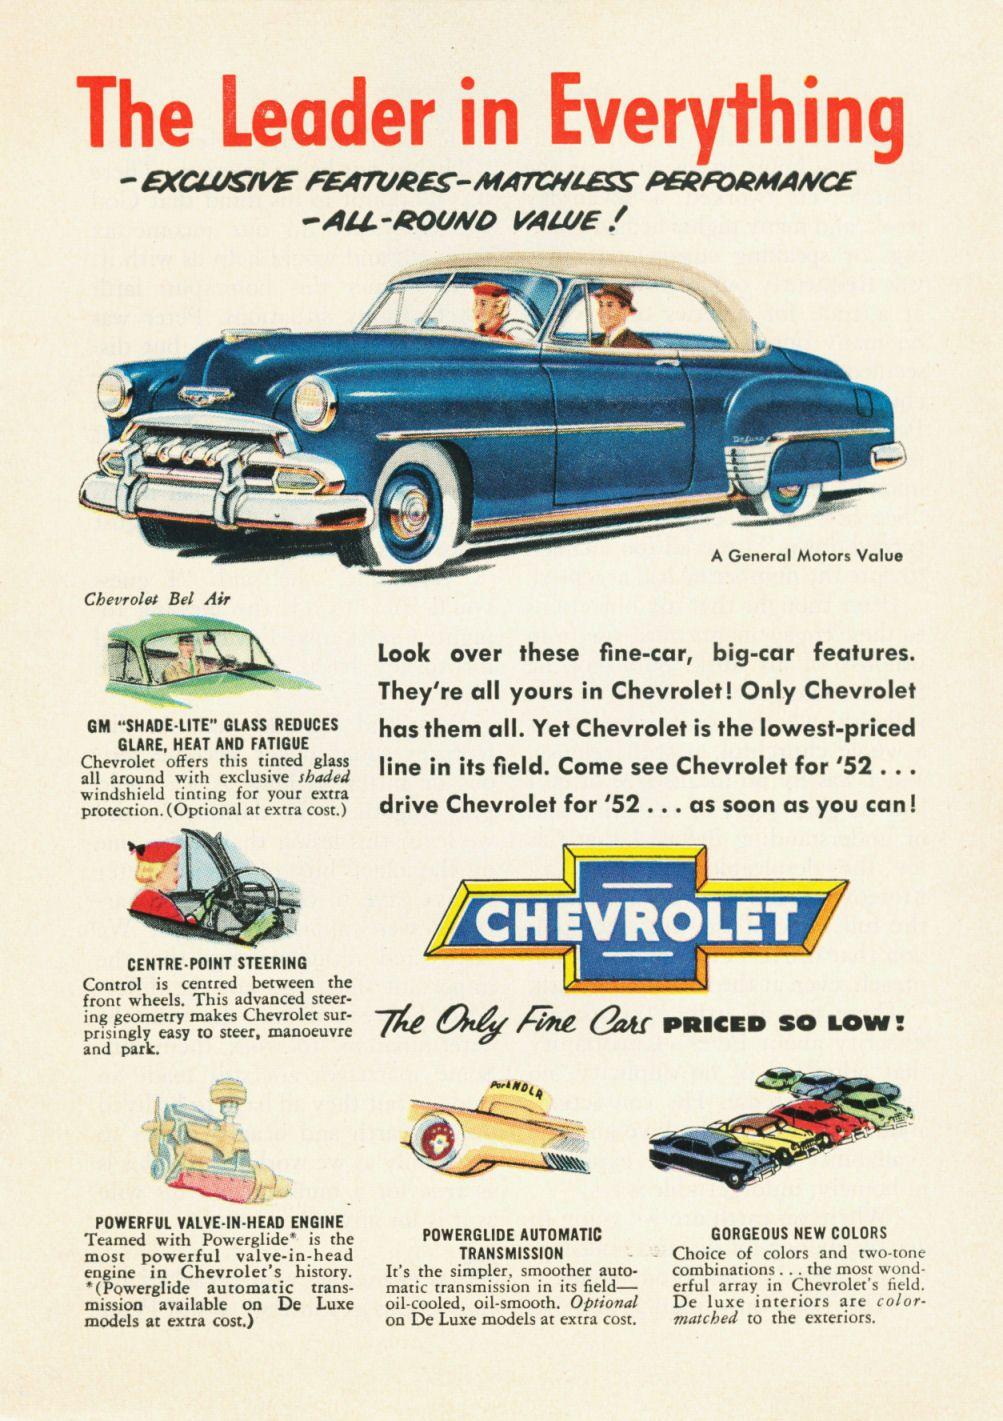 1952 Chevrolet Styleline Deluxe Bel Air Automobile Advertising